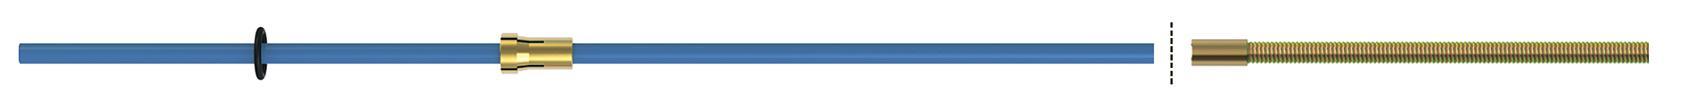 Канал направляющий Fubag Fb.tlb-30